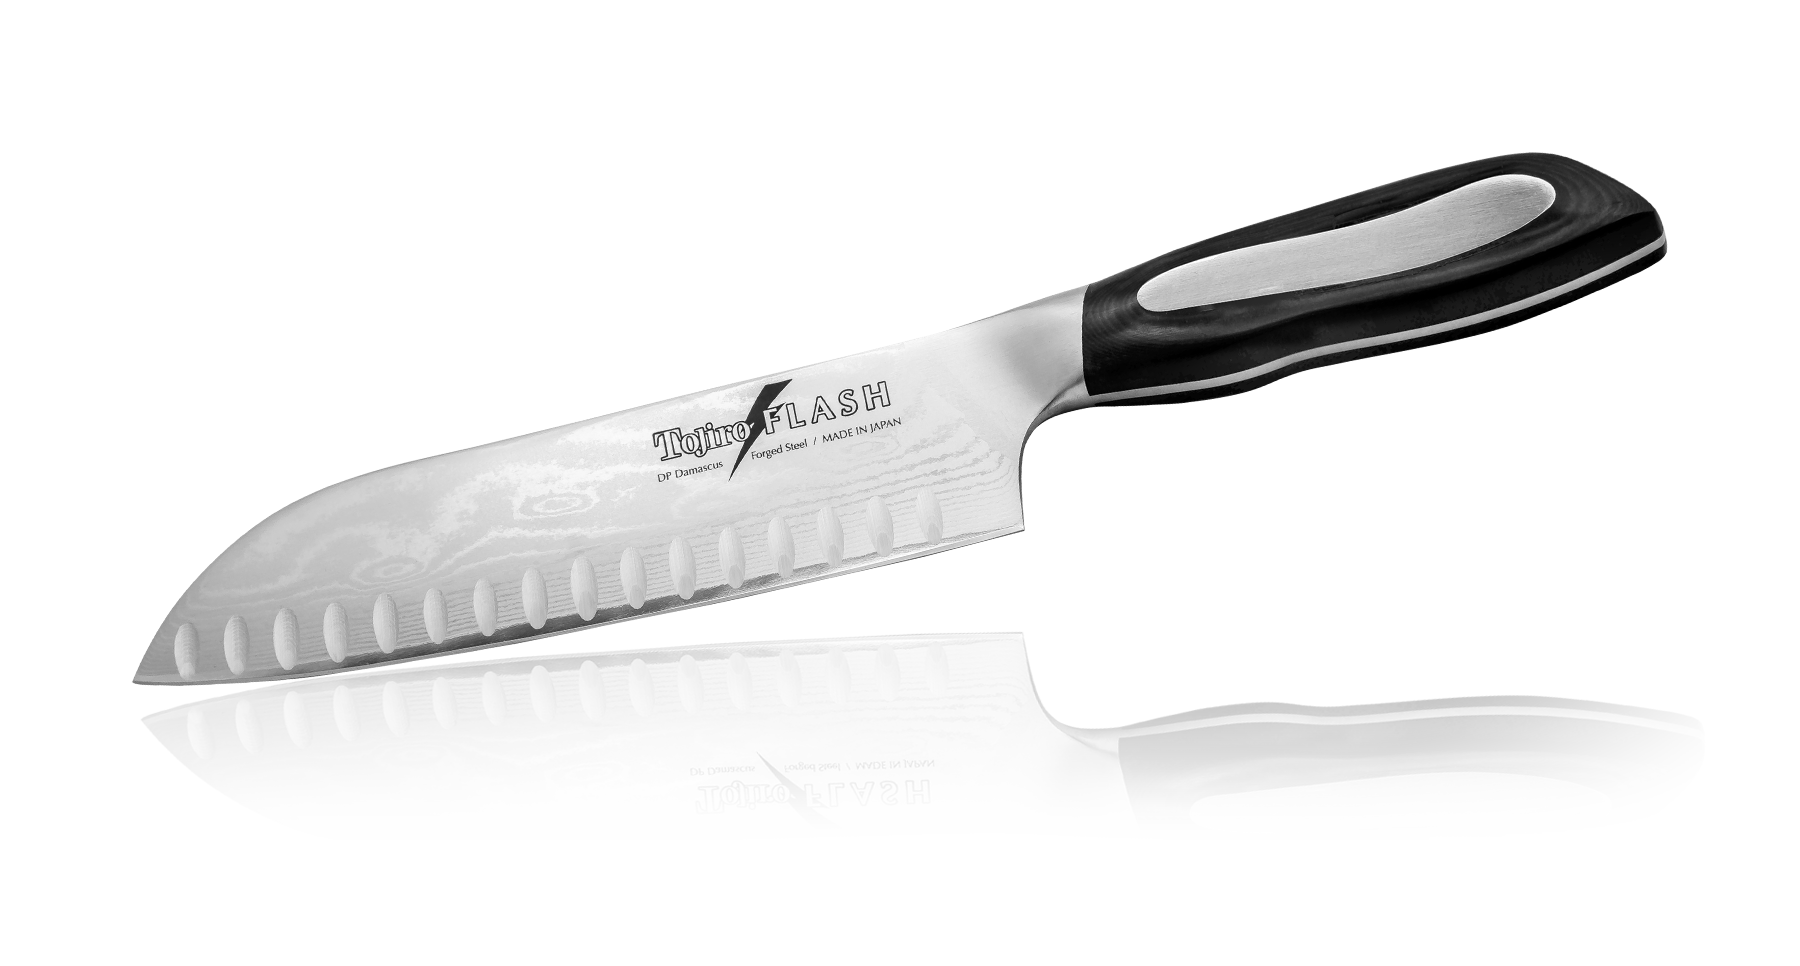 Нож Сантоку Tojiro Flash 180 мм с насечками, сталь VG-10